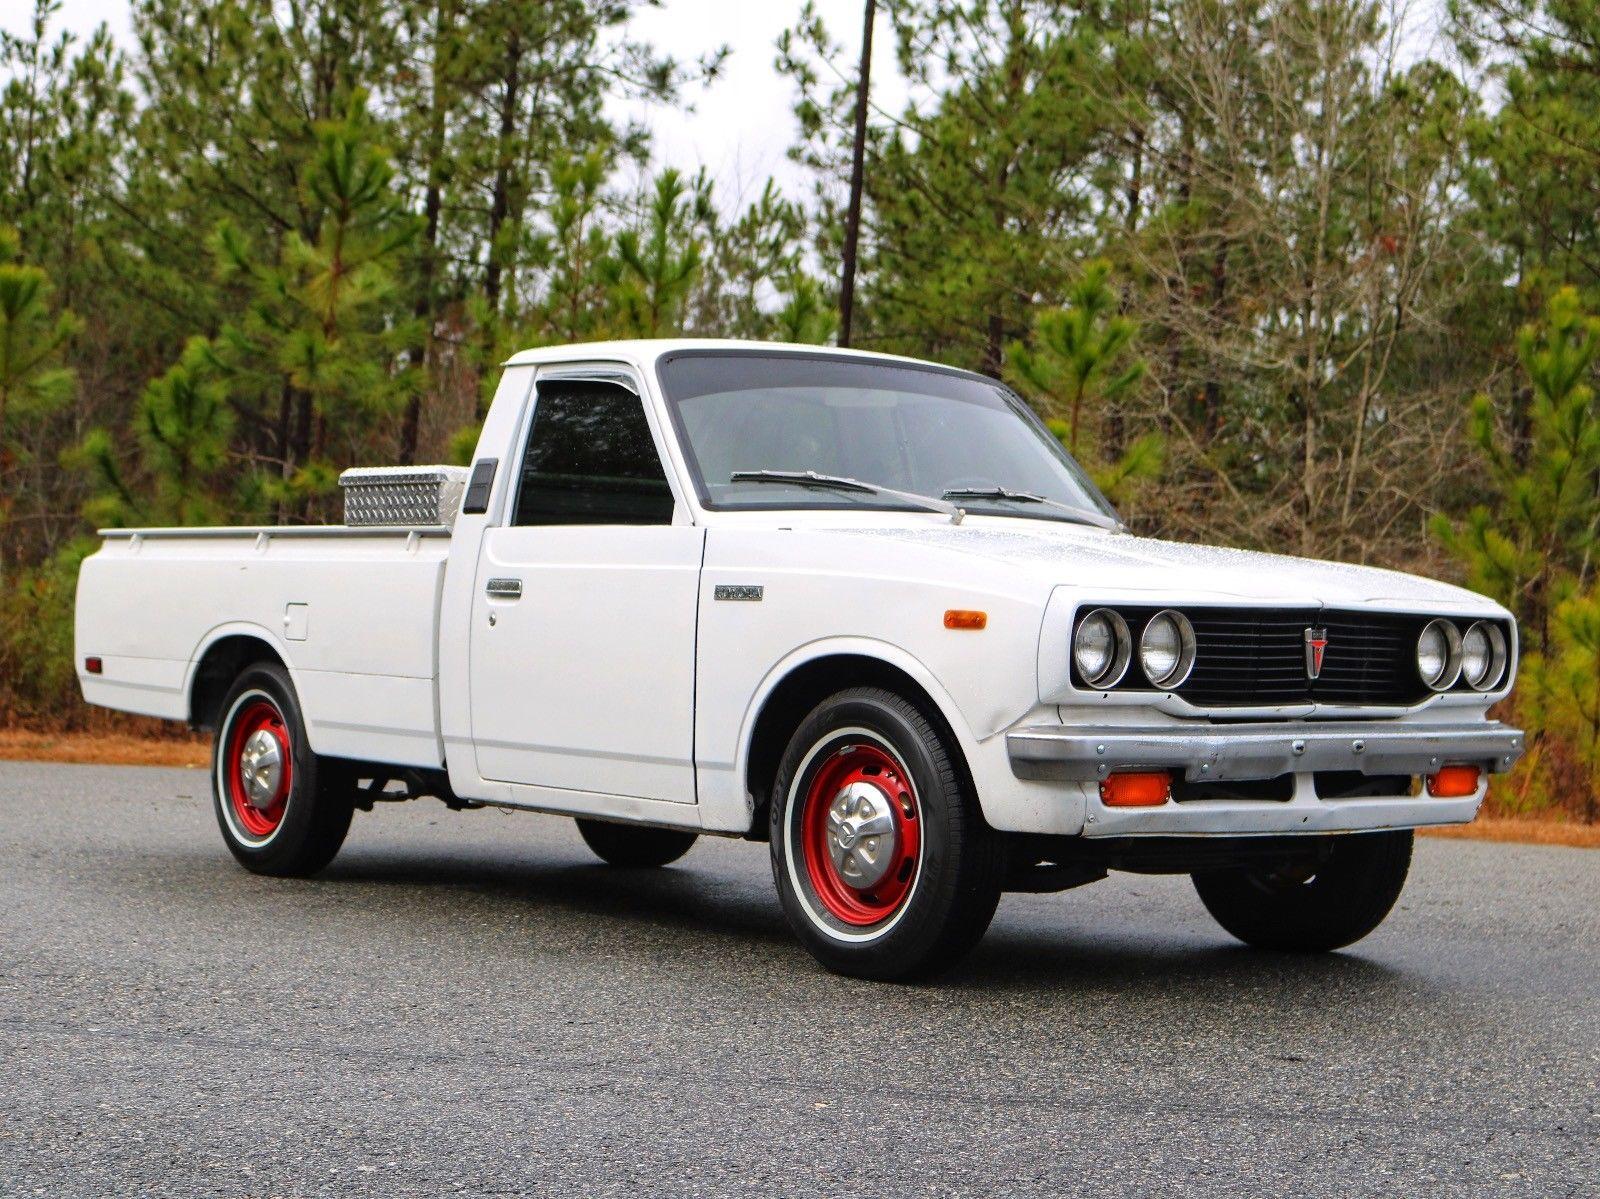 Rebuilt Reliable Ride  1977 Toyota Sr5 Pickup